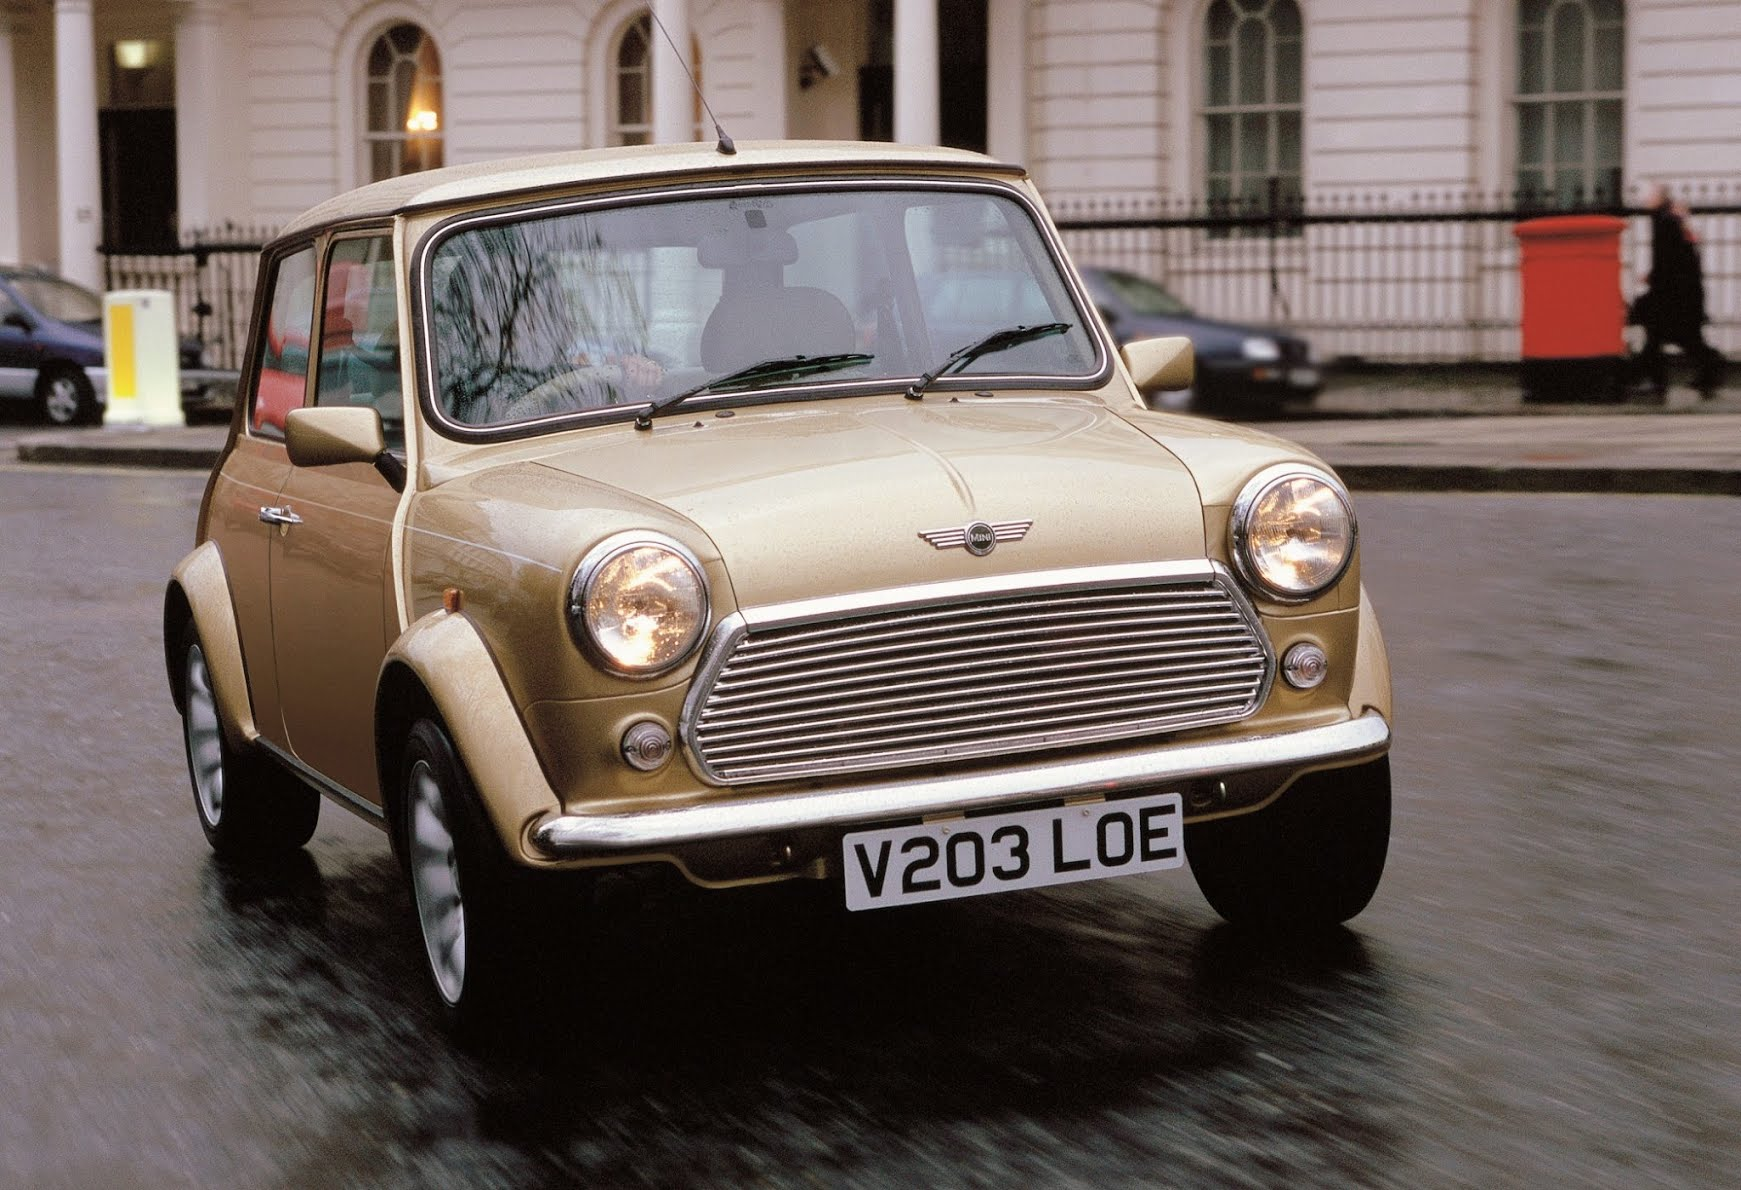 Plus belles voitures du monde - Austin Mini Cooper